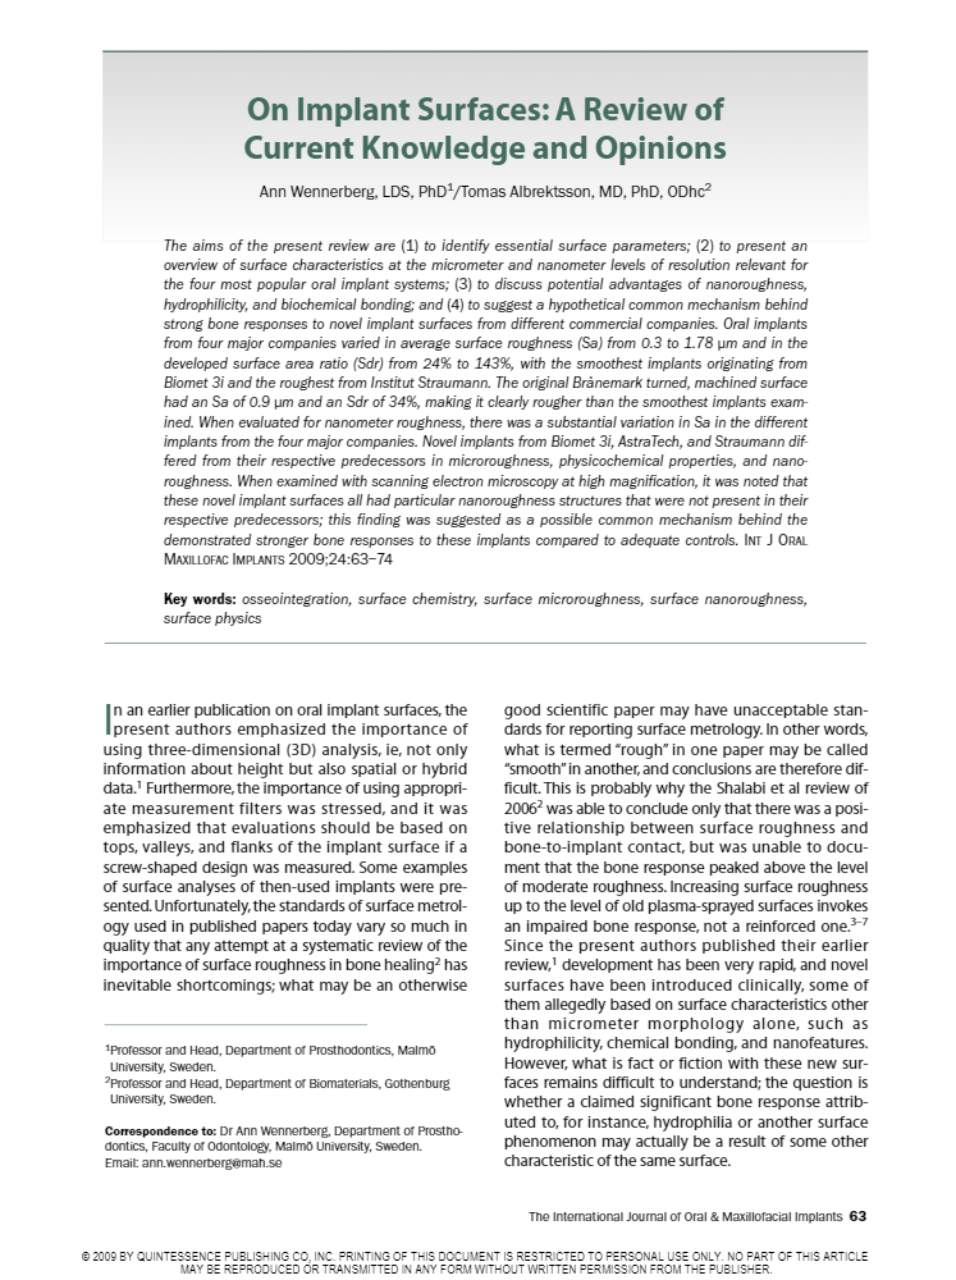 Int J Oral Maxillofac Implants 2010 Wennerberg